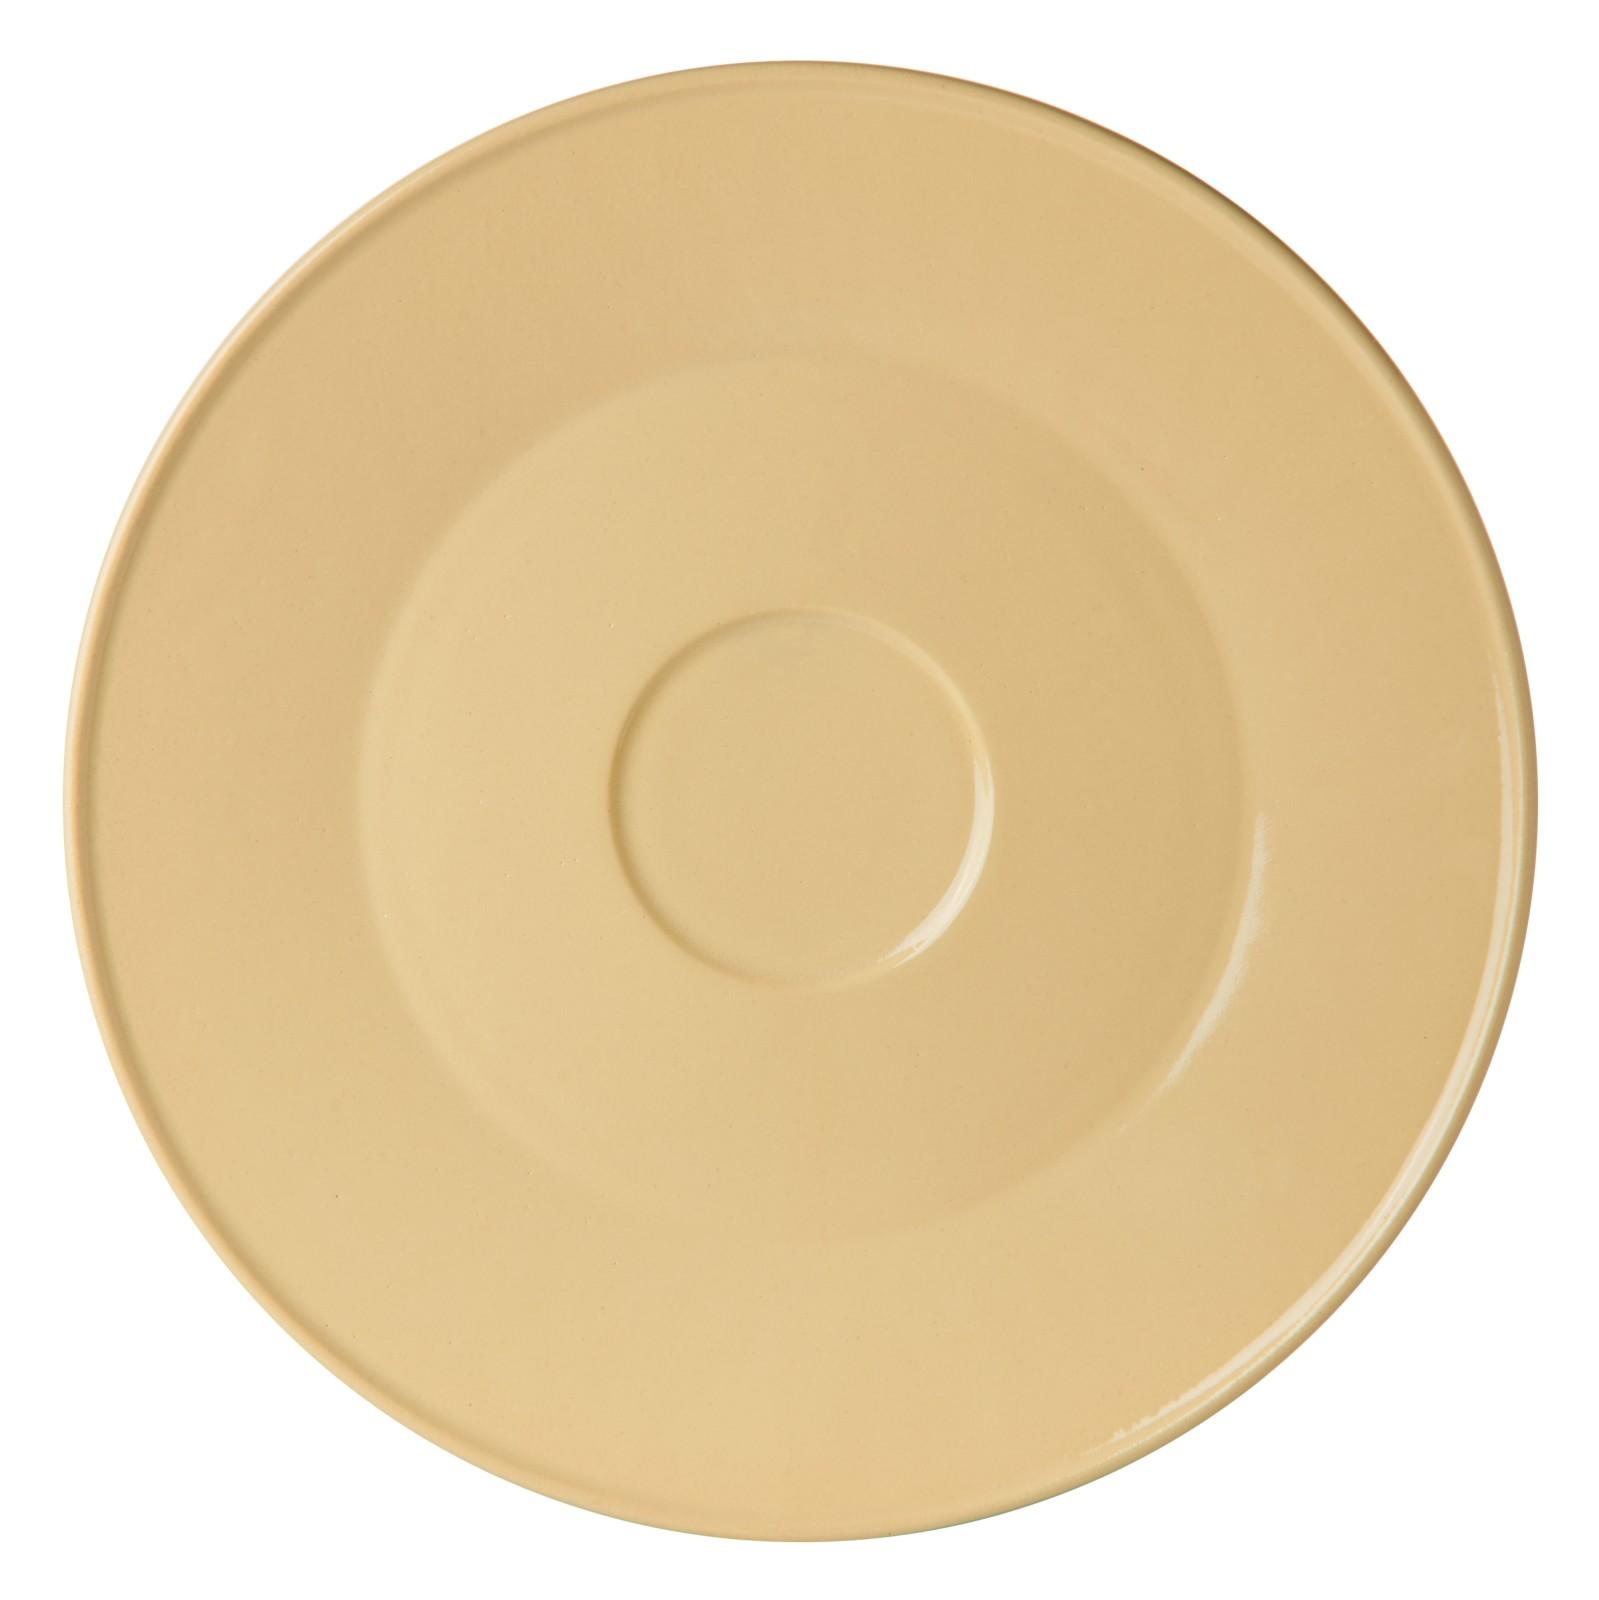 Unison Ceramic Big Plate Yellow